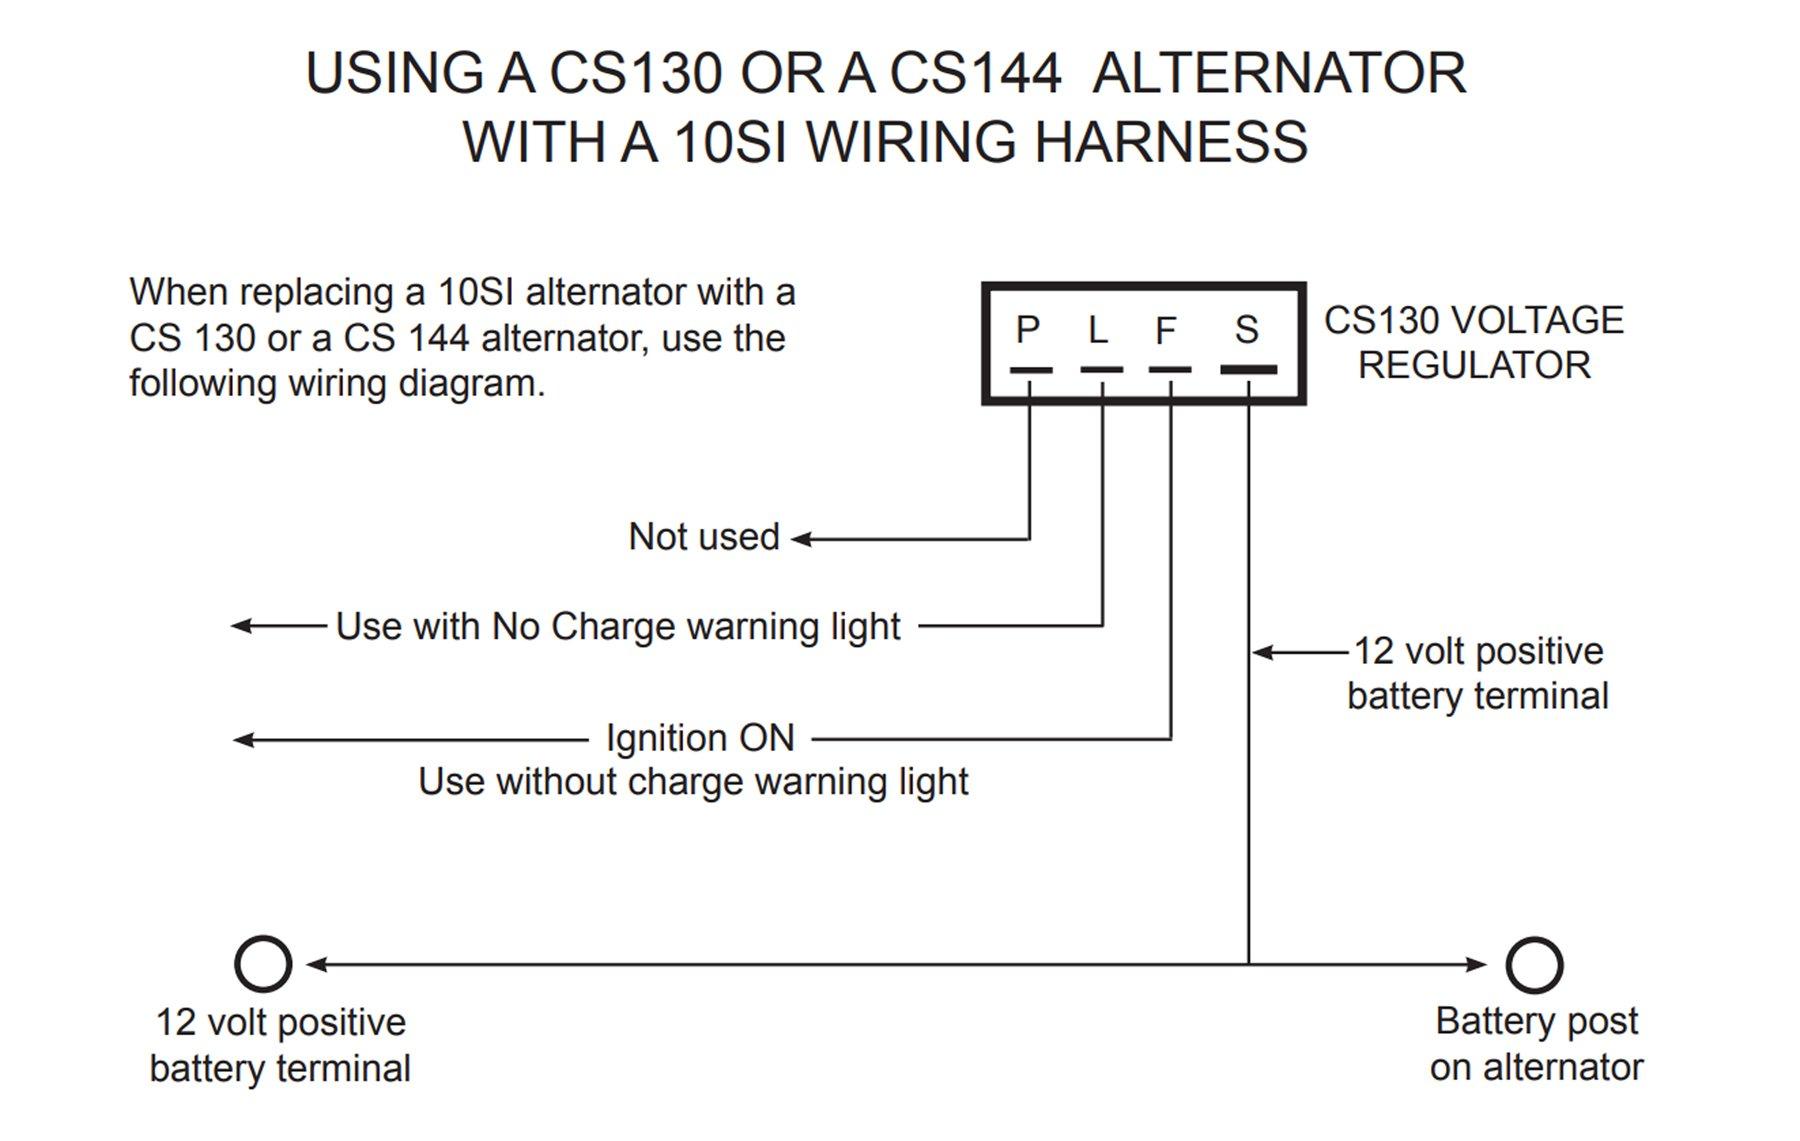 alternator-upgrade-wiring-tips-for-popul